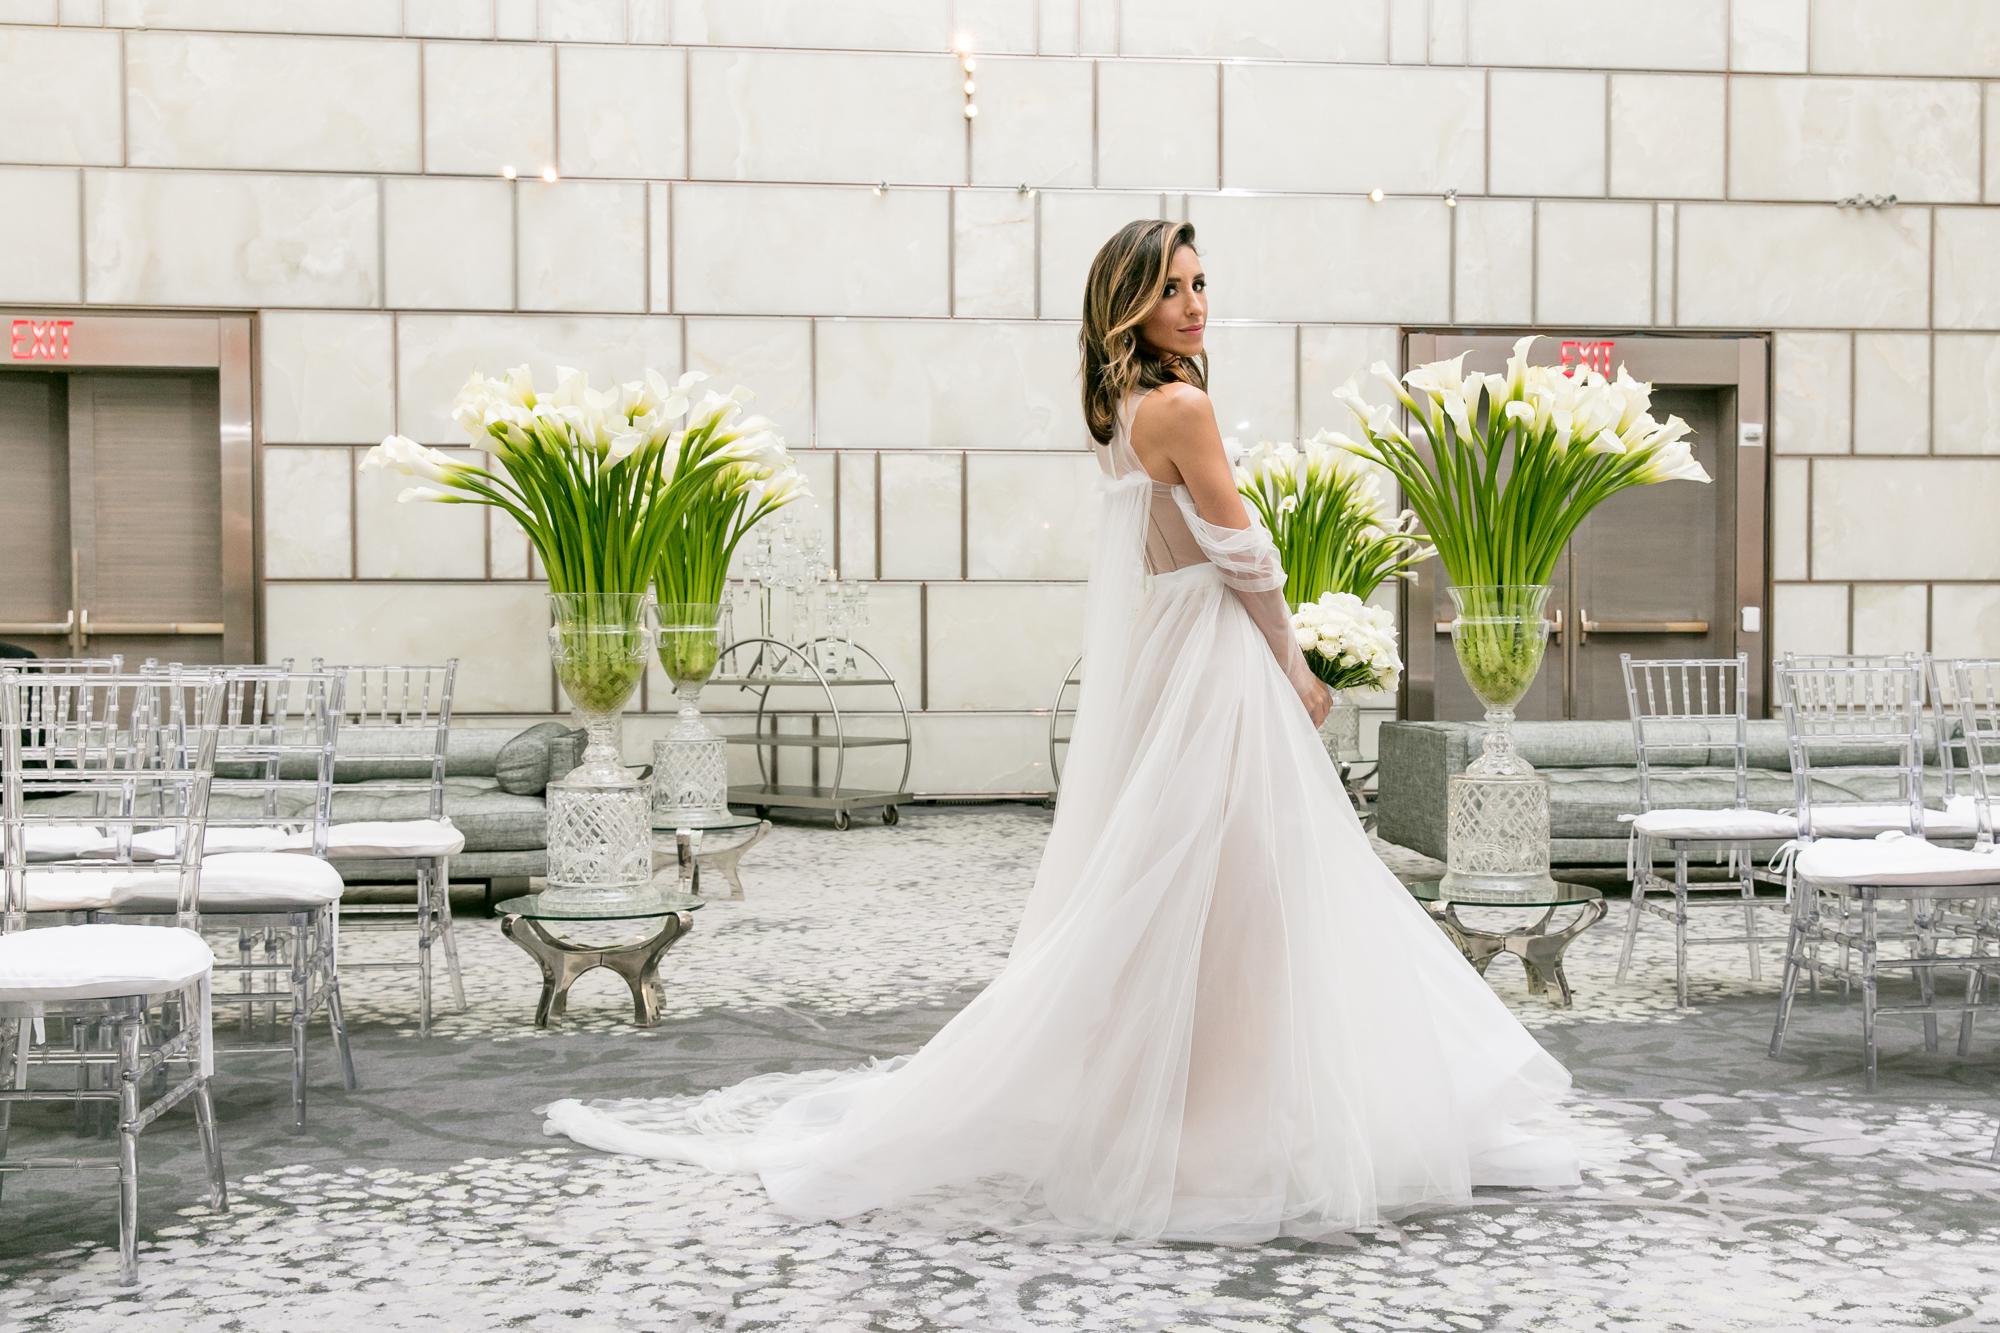 terri-diamond-photography-wedding_2031.jpg